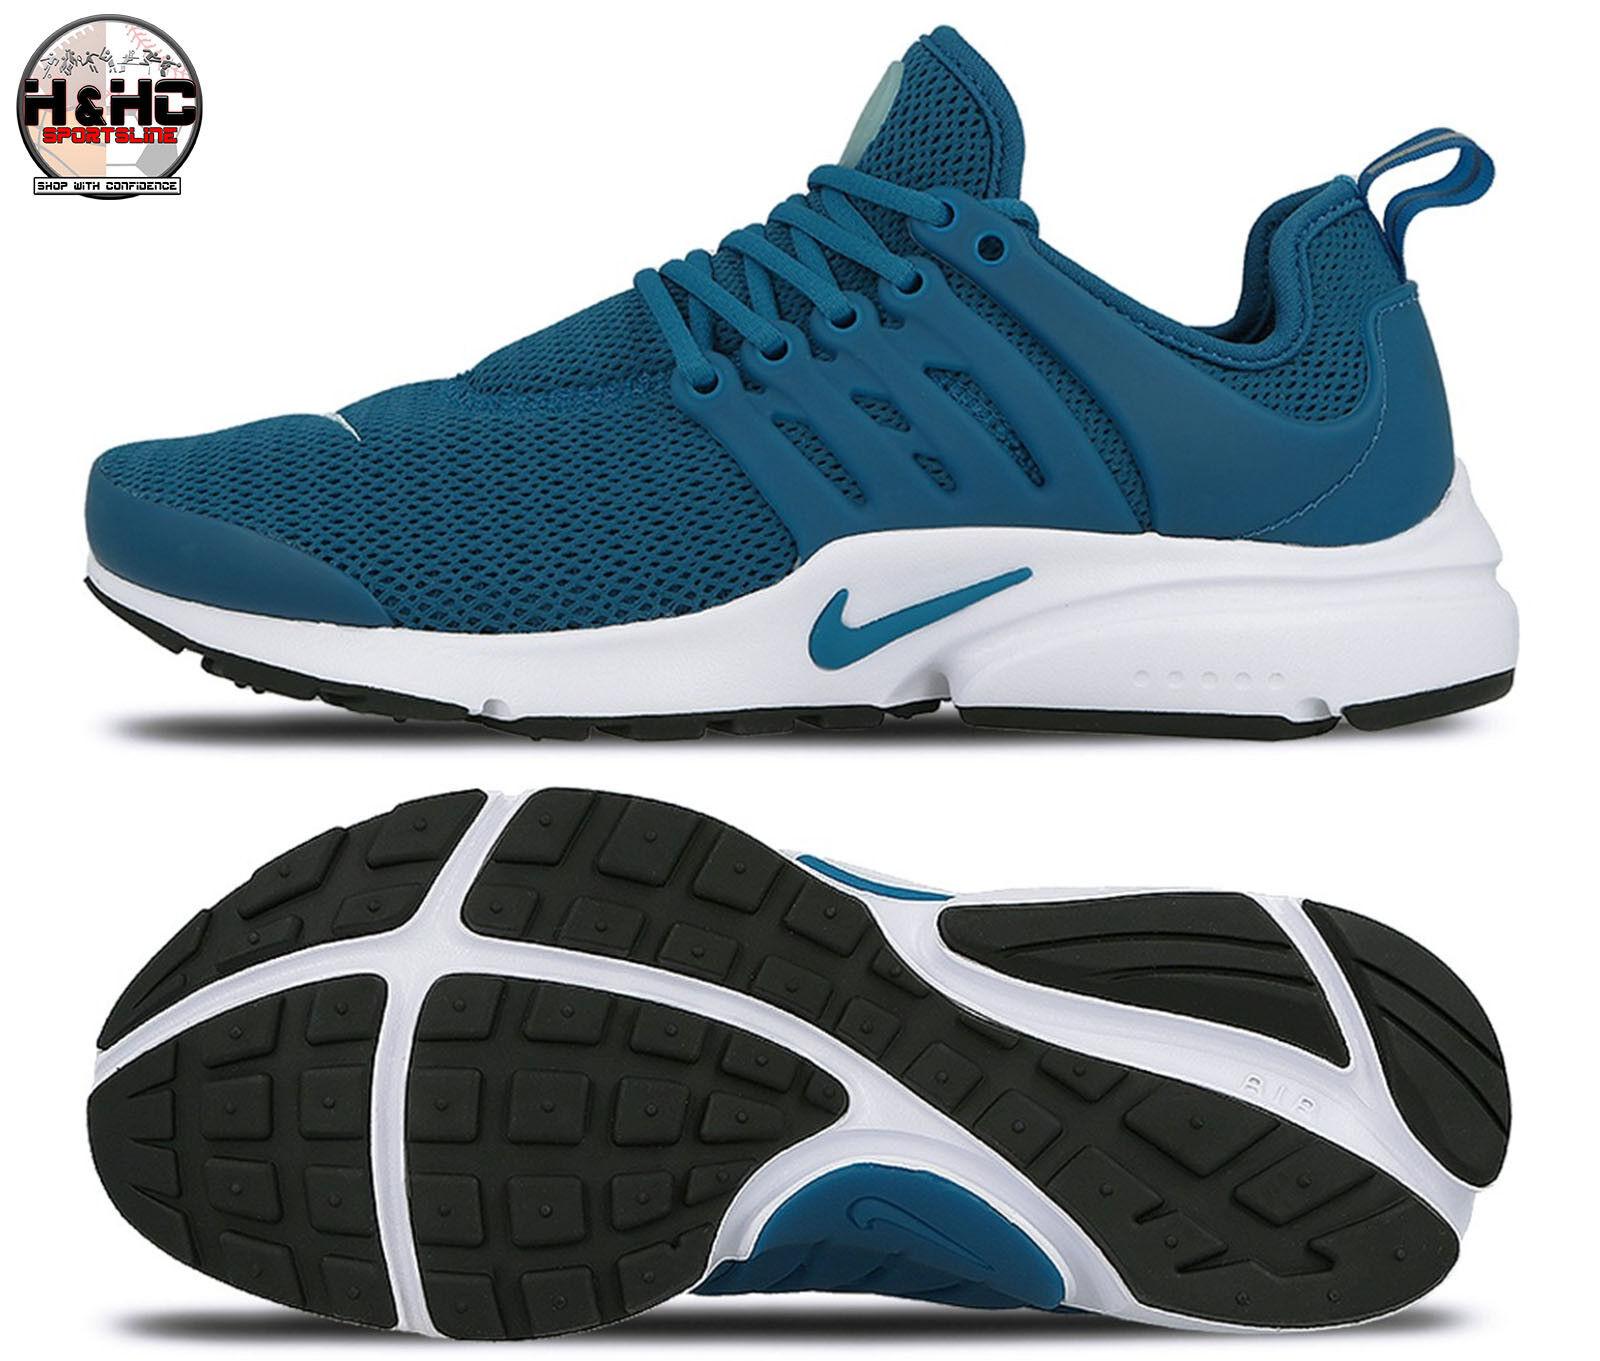 6573e79f4dbb Nike Air Presto 878068 402 Industrial Blue White Women s Shoes Sz Sz Sz 12  713c22